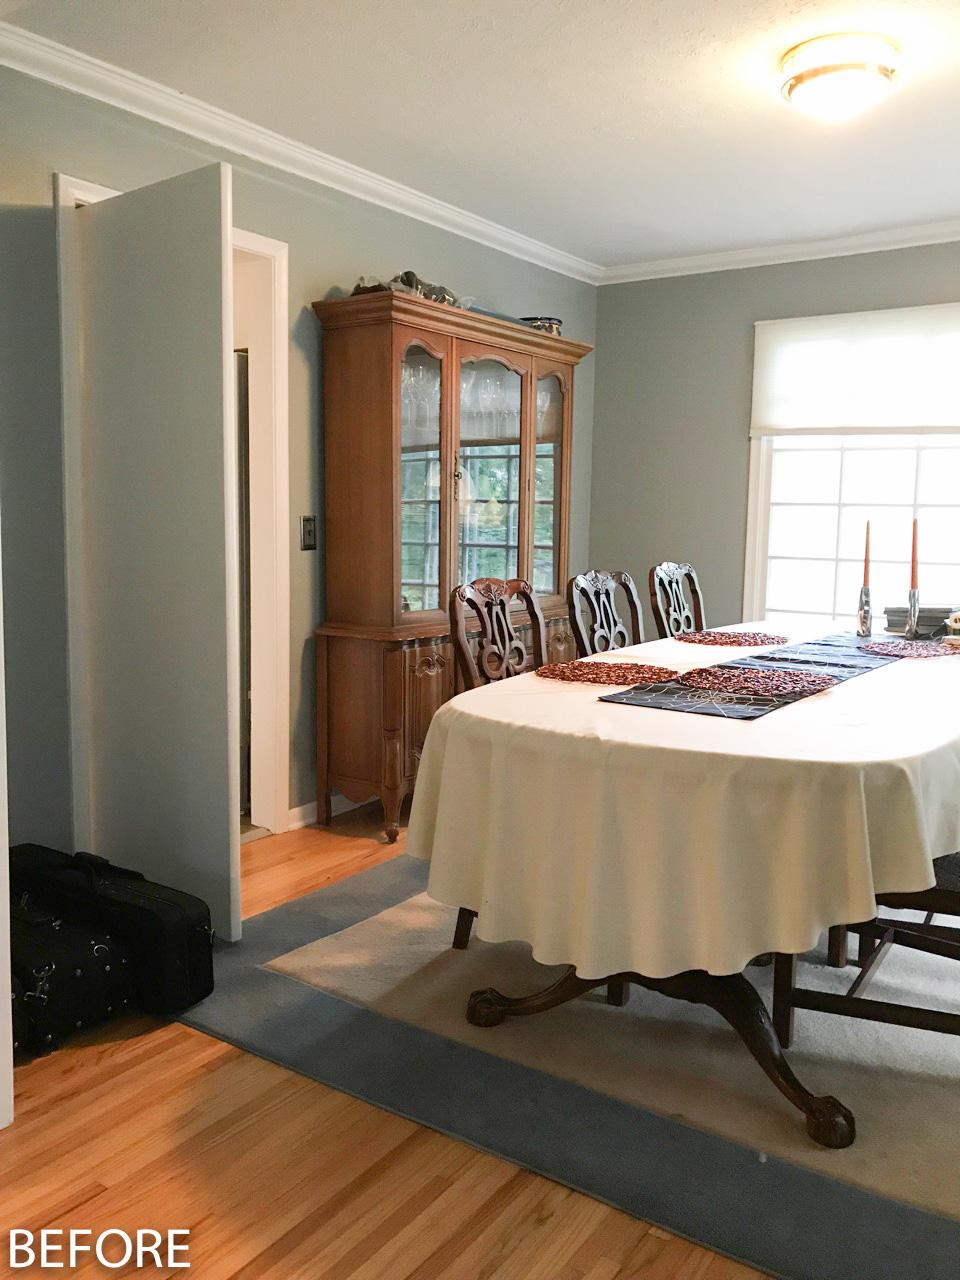 Retuned Traditional Dining Room Before-6.jpg